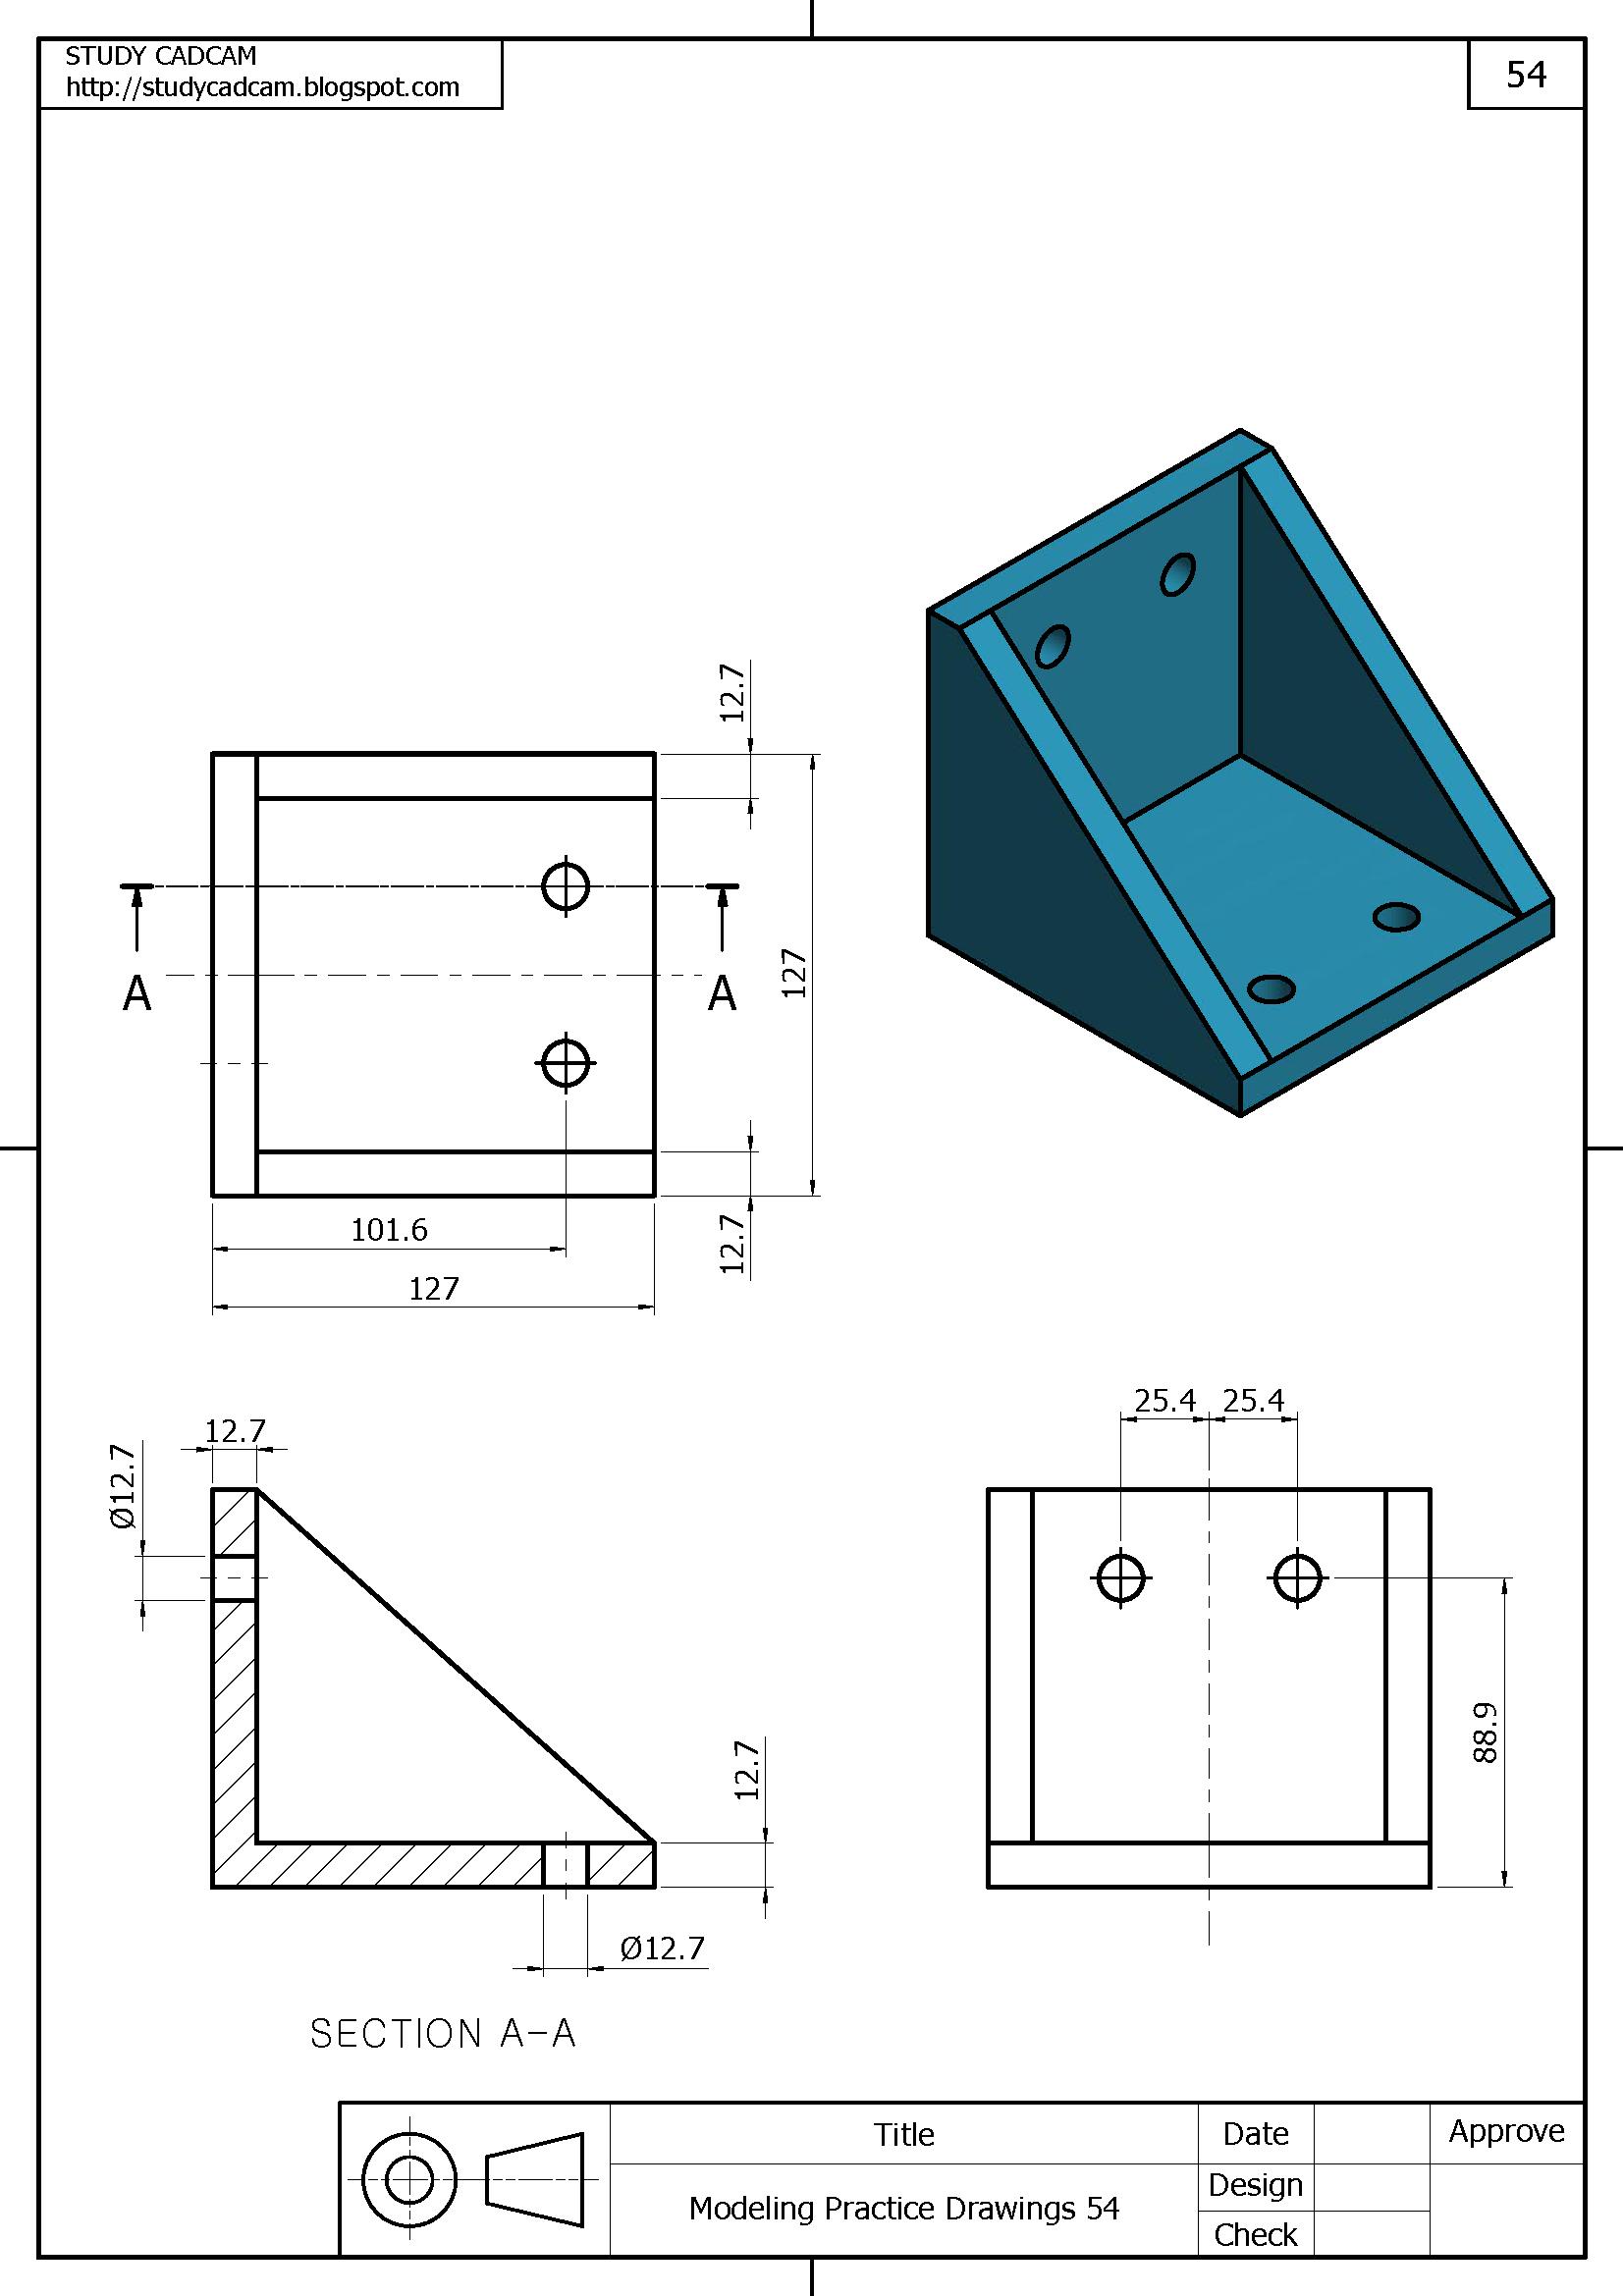 Pin De Fgnkrsc En My Drawings Ejercicios De Dibujo Dibujo Tecnico Ejercicios Tecnicas De Dibujo